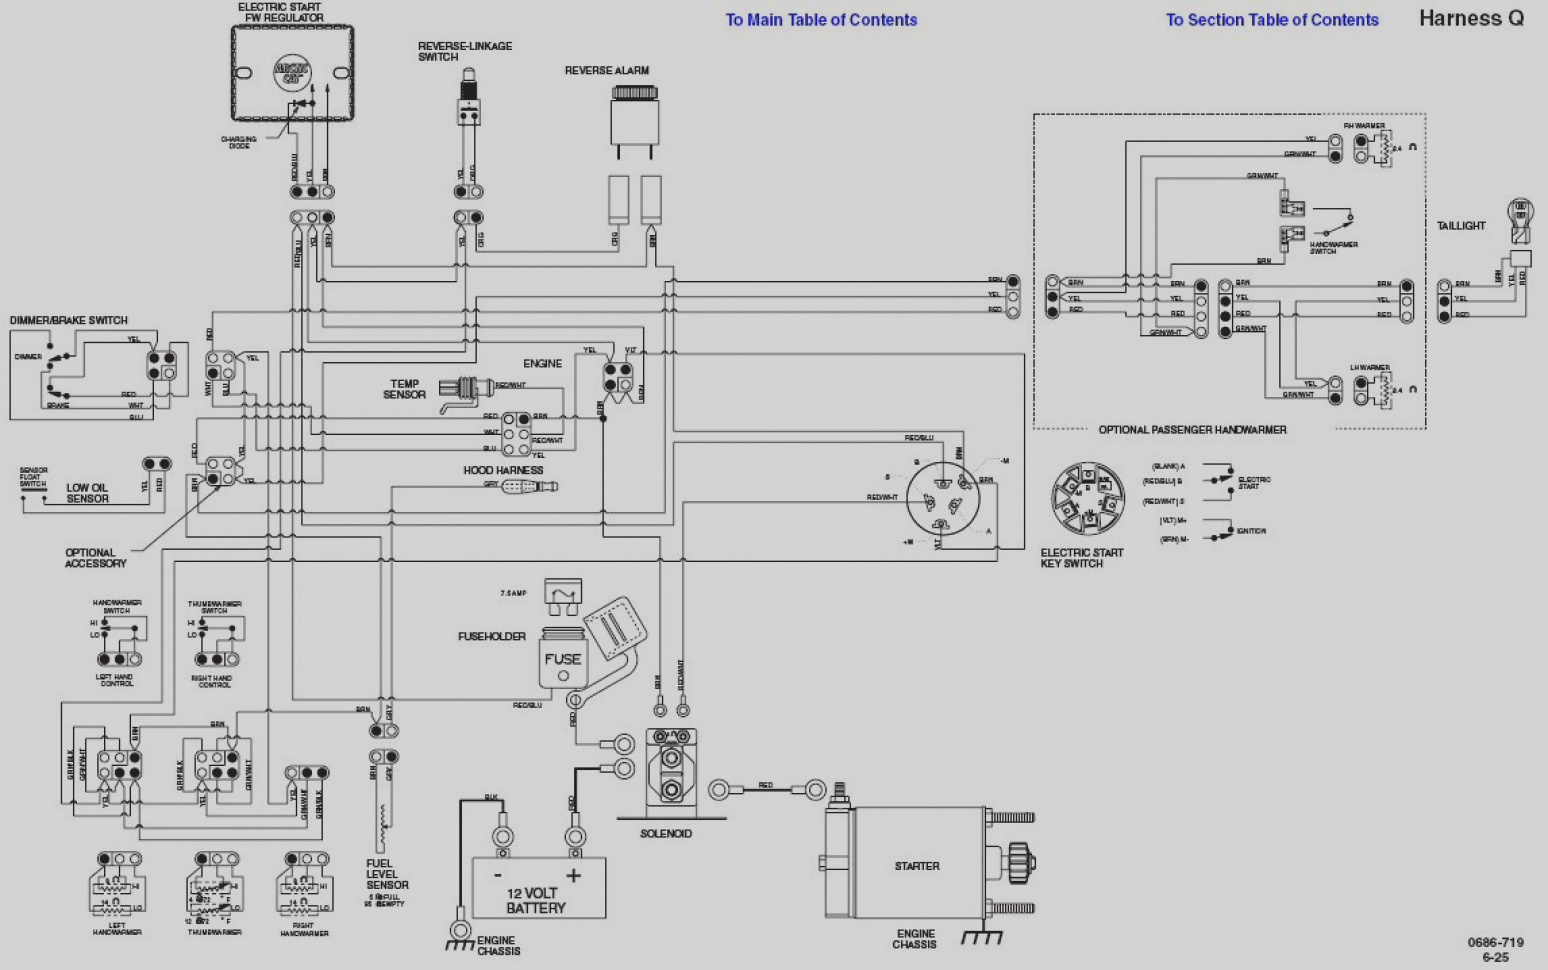 polaris snowmobile wiring diagrams 7be2bd polaris 550 lx 2007 wiring diagram wiring library  7be2bd polaris 550 lx 2007 wiring